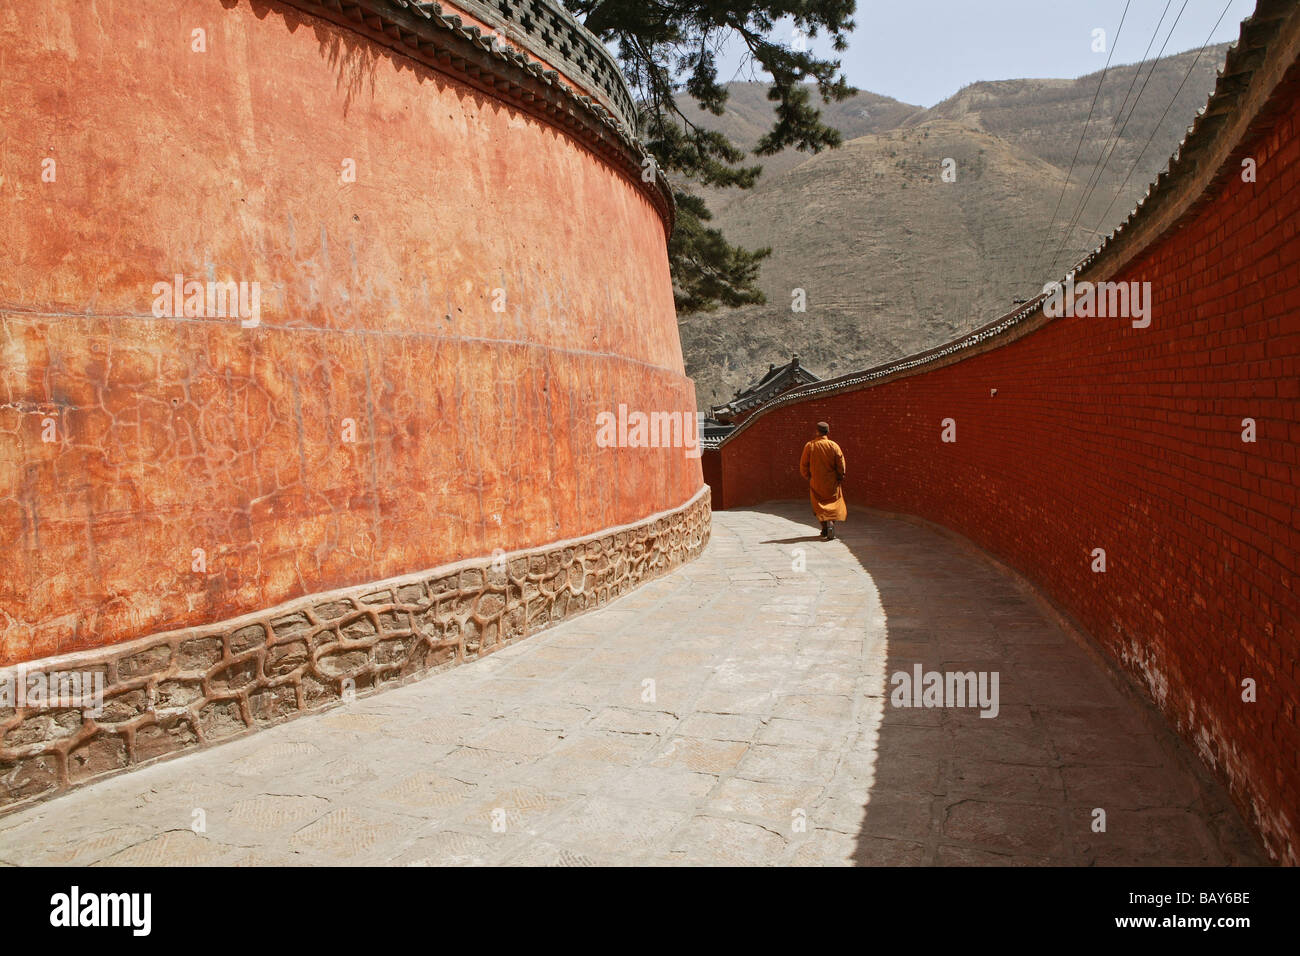 Monk walking to Pusa Ding Summit, high walls of the monastery, Xiantong Monastery, Wutai Shan, Five Terrace Mountain, - Stock Image